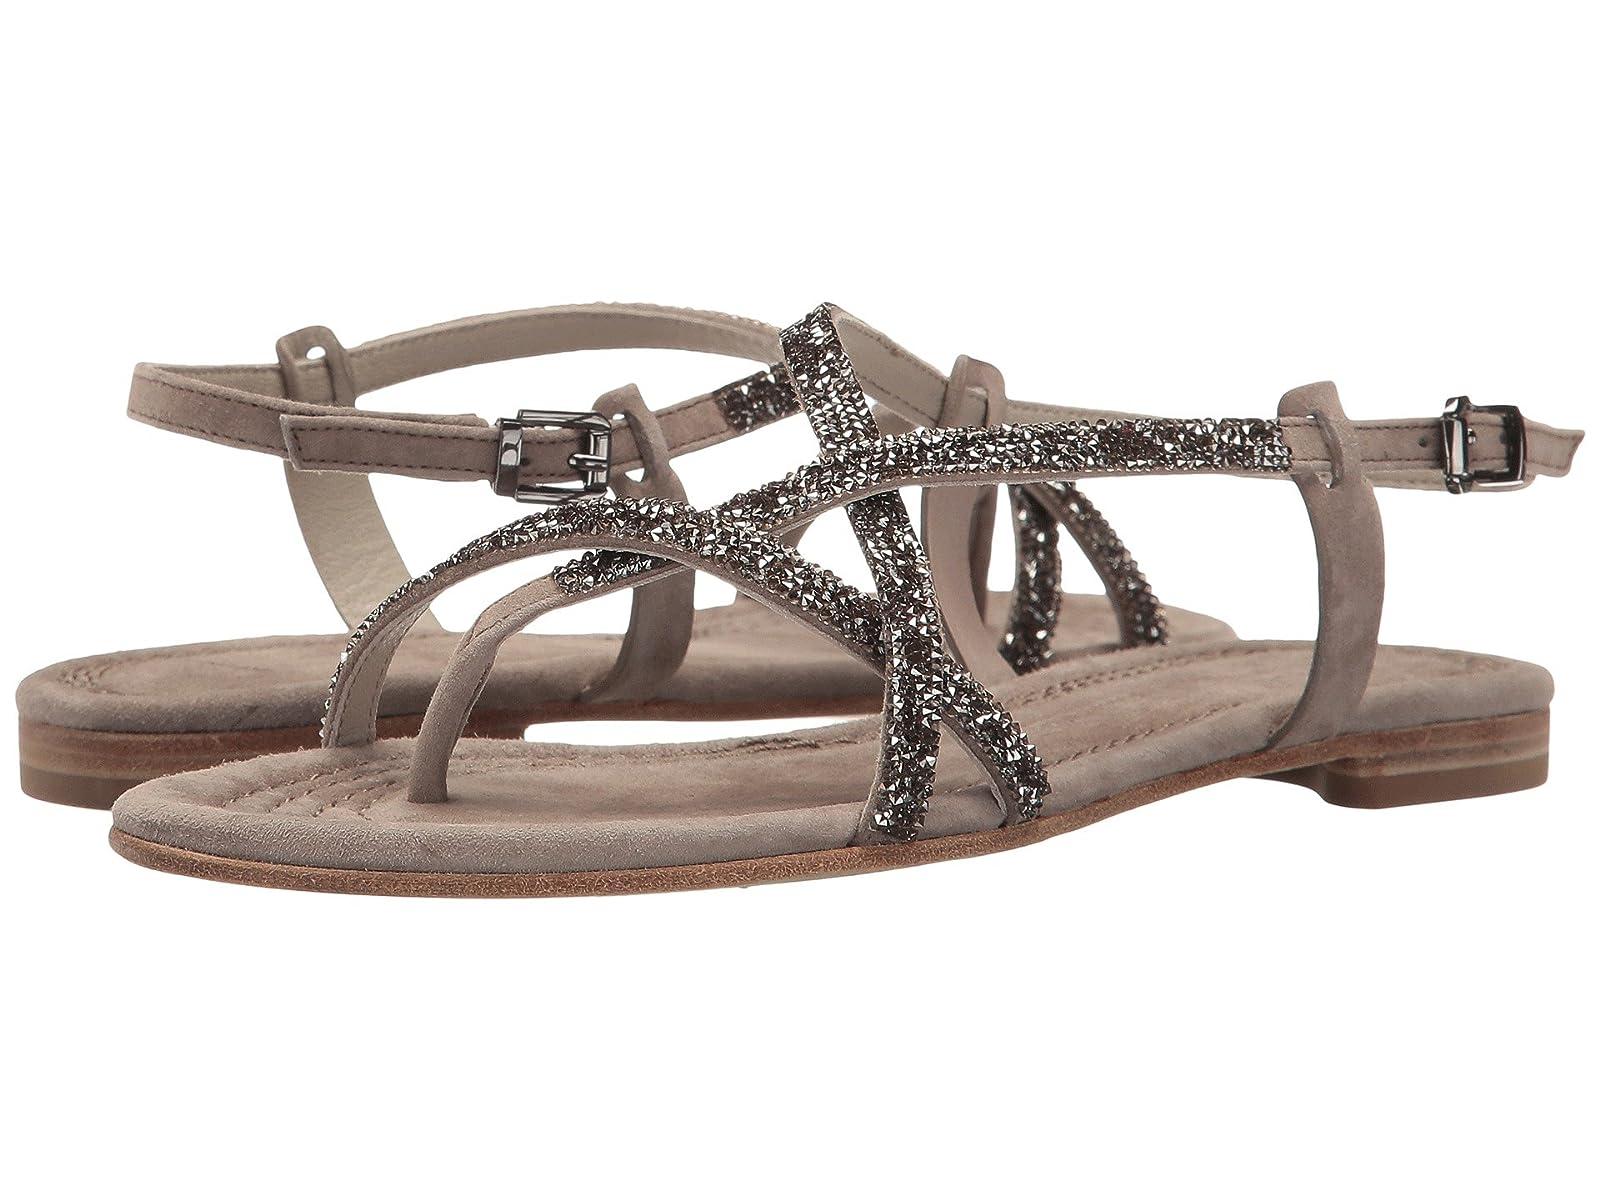 Kennel & Schmenger Sparkle Elle SandalCheap and distinctive eye-catching shoes